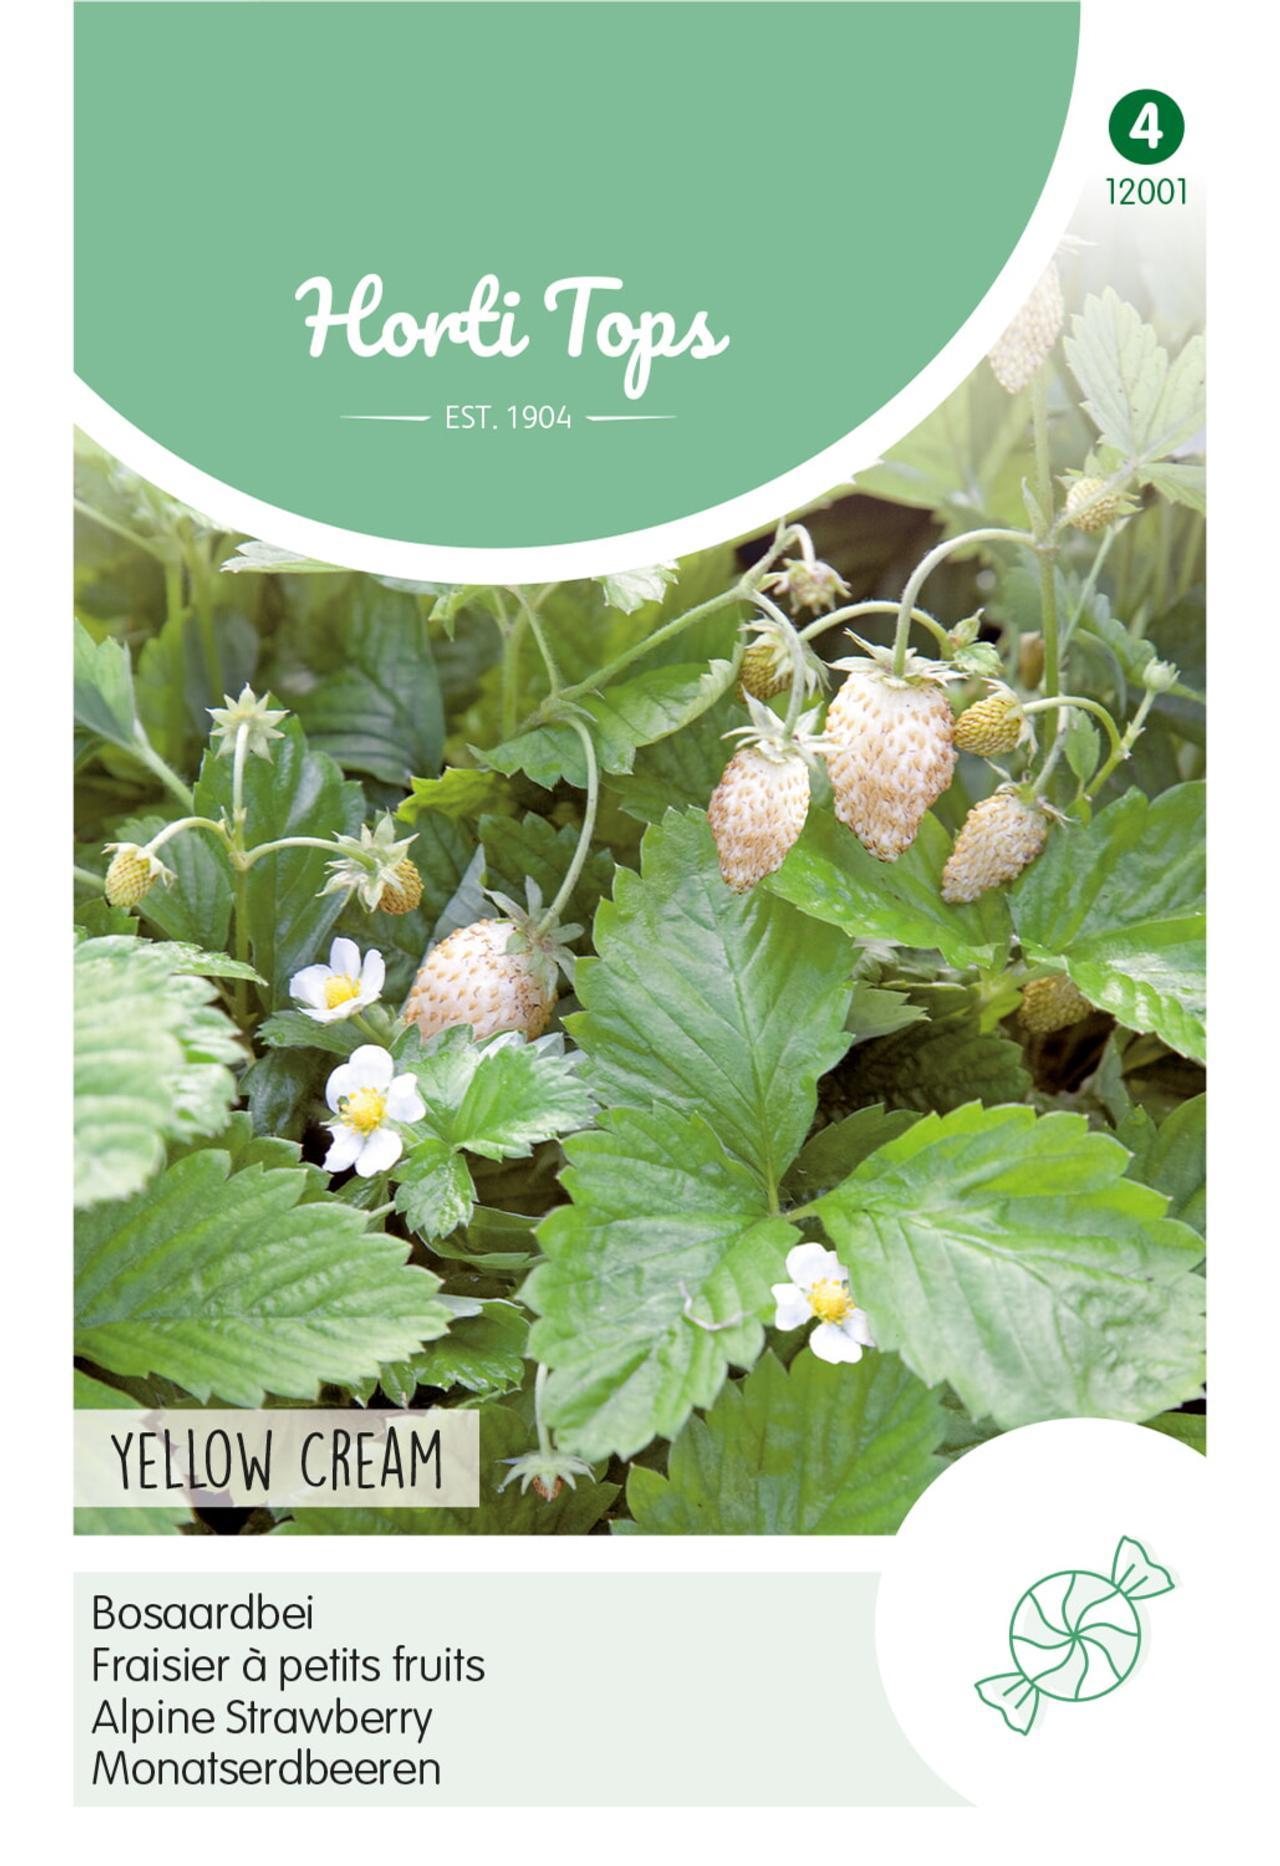 Fragaria vesca 'Yellow Cream' plant